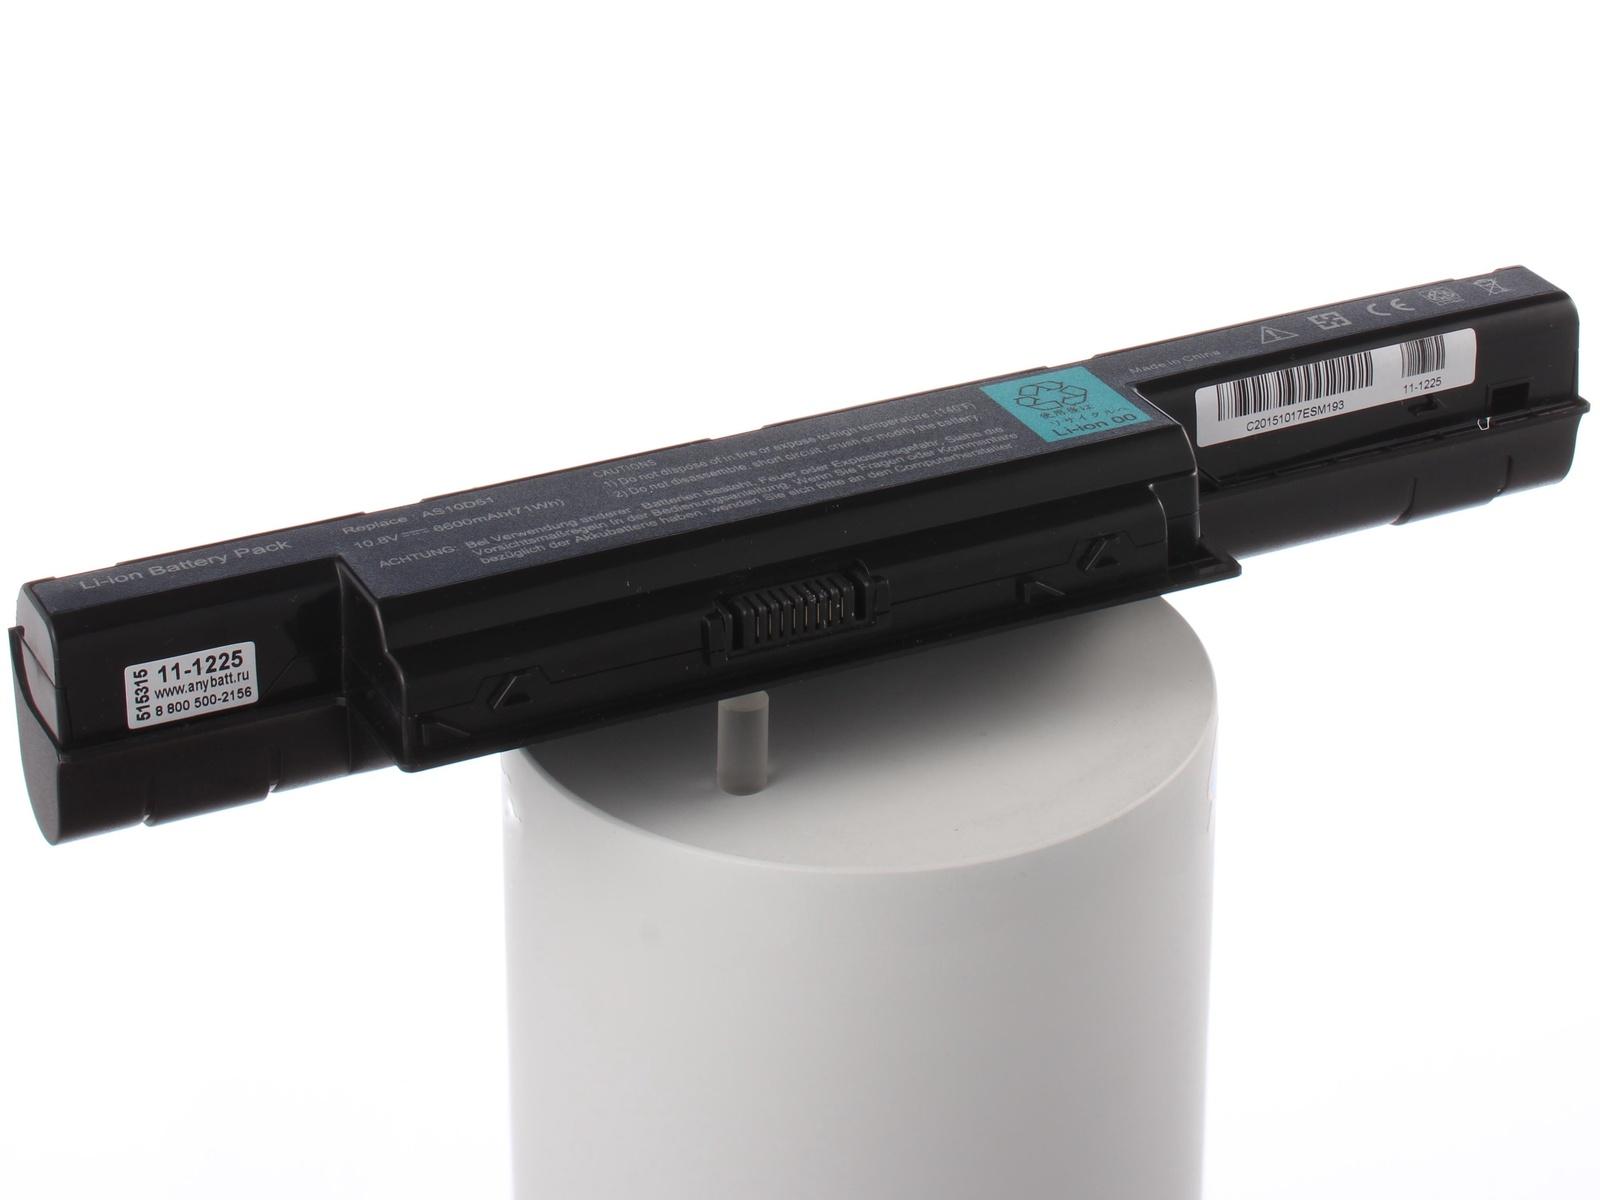 Аккумулятор для ноутбука AnyBatt для Acer Aspire 7750ZG-B964G64Mnkk, Aspire E1-531-10002G32Mnks, Aspire E1-571G-32324G50Mn, Aspire E1-772G-54204G50Mn, Aspire V3-551-10464G50Makk, Aspire V3-551G-64404G50Makk аккумулятор для ноутбука anybatt для acer aspire 7750g 2354g64mnkk aspire 7750zg b962g32mnkk aspire e1 530 21174g75mn aspire e1 531 b822g50mnks aspire e1 531g b9604g75ma aspire e1 570 33214g75mnkk aspire e1 571 33114g50mnks